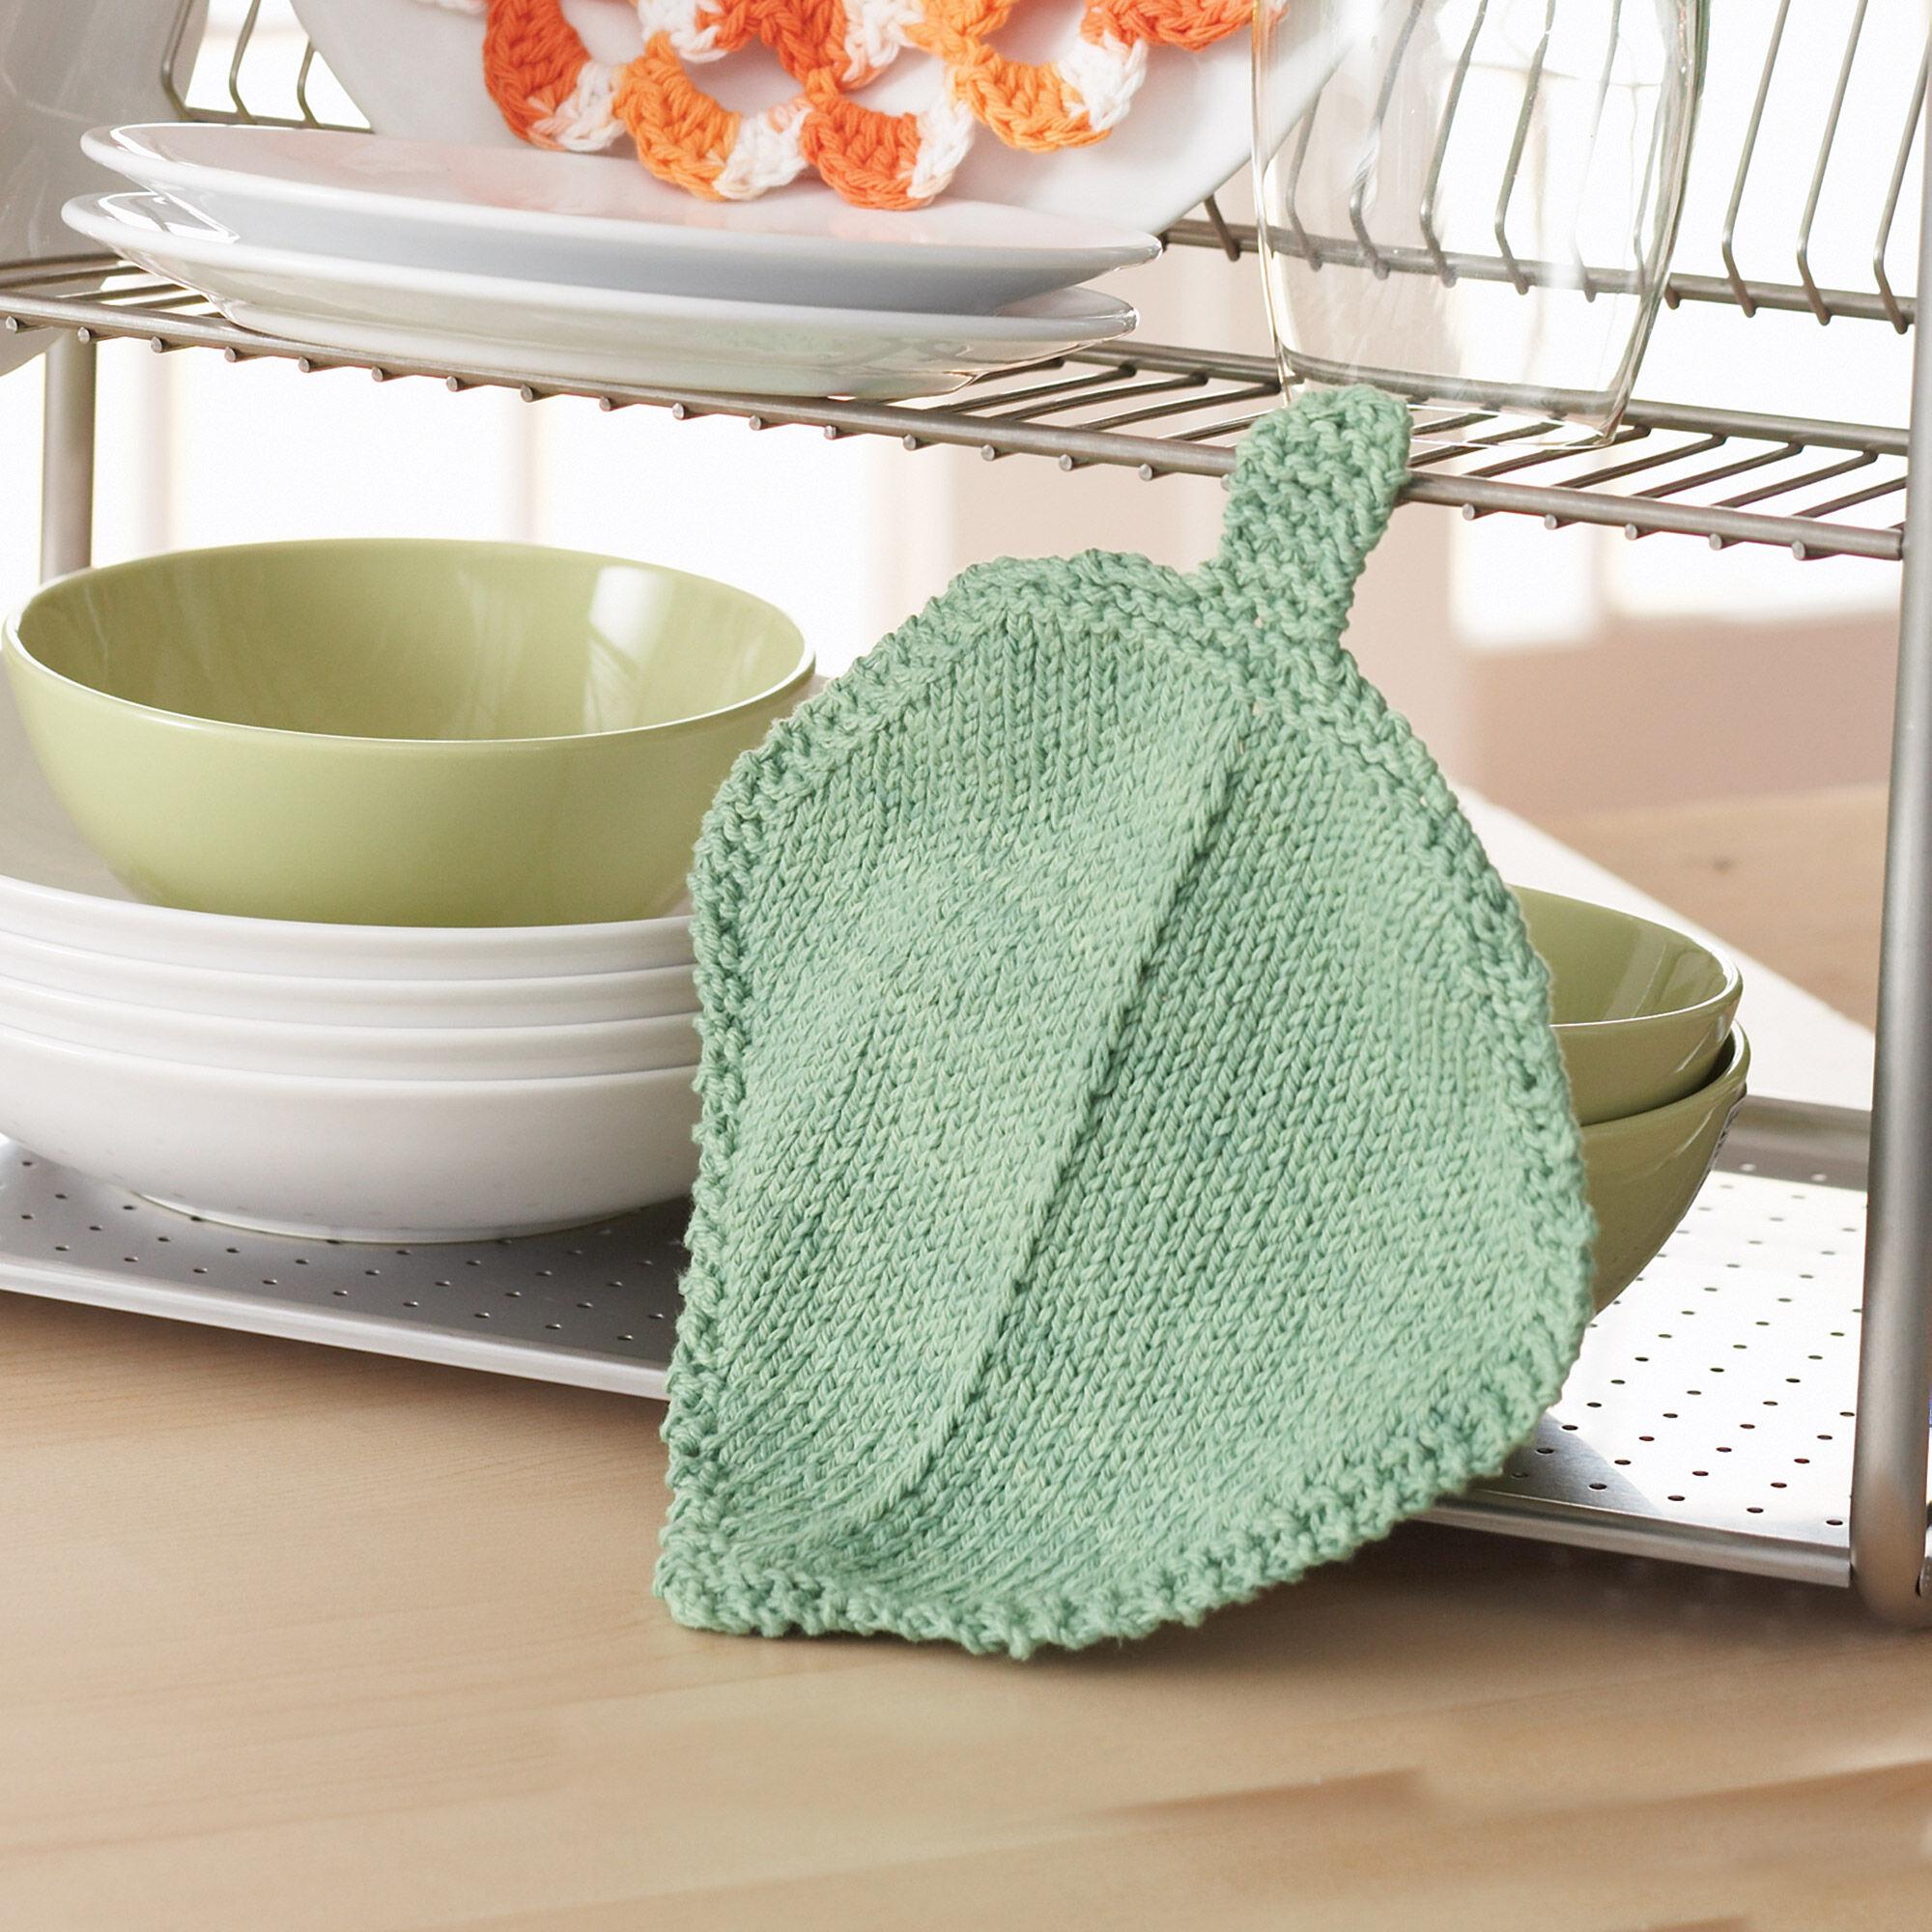 Bernat Garden Leaf Dishcloth | Yarnspirations